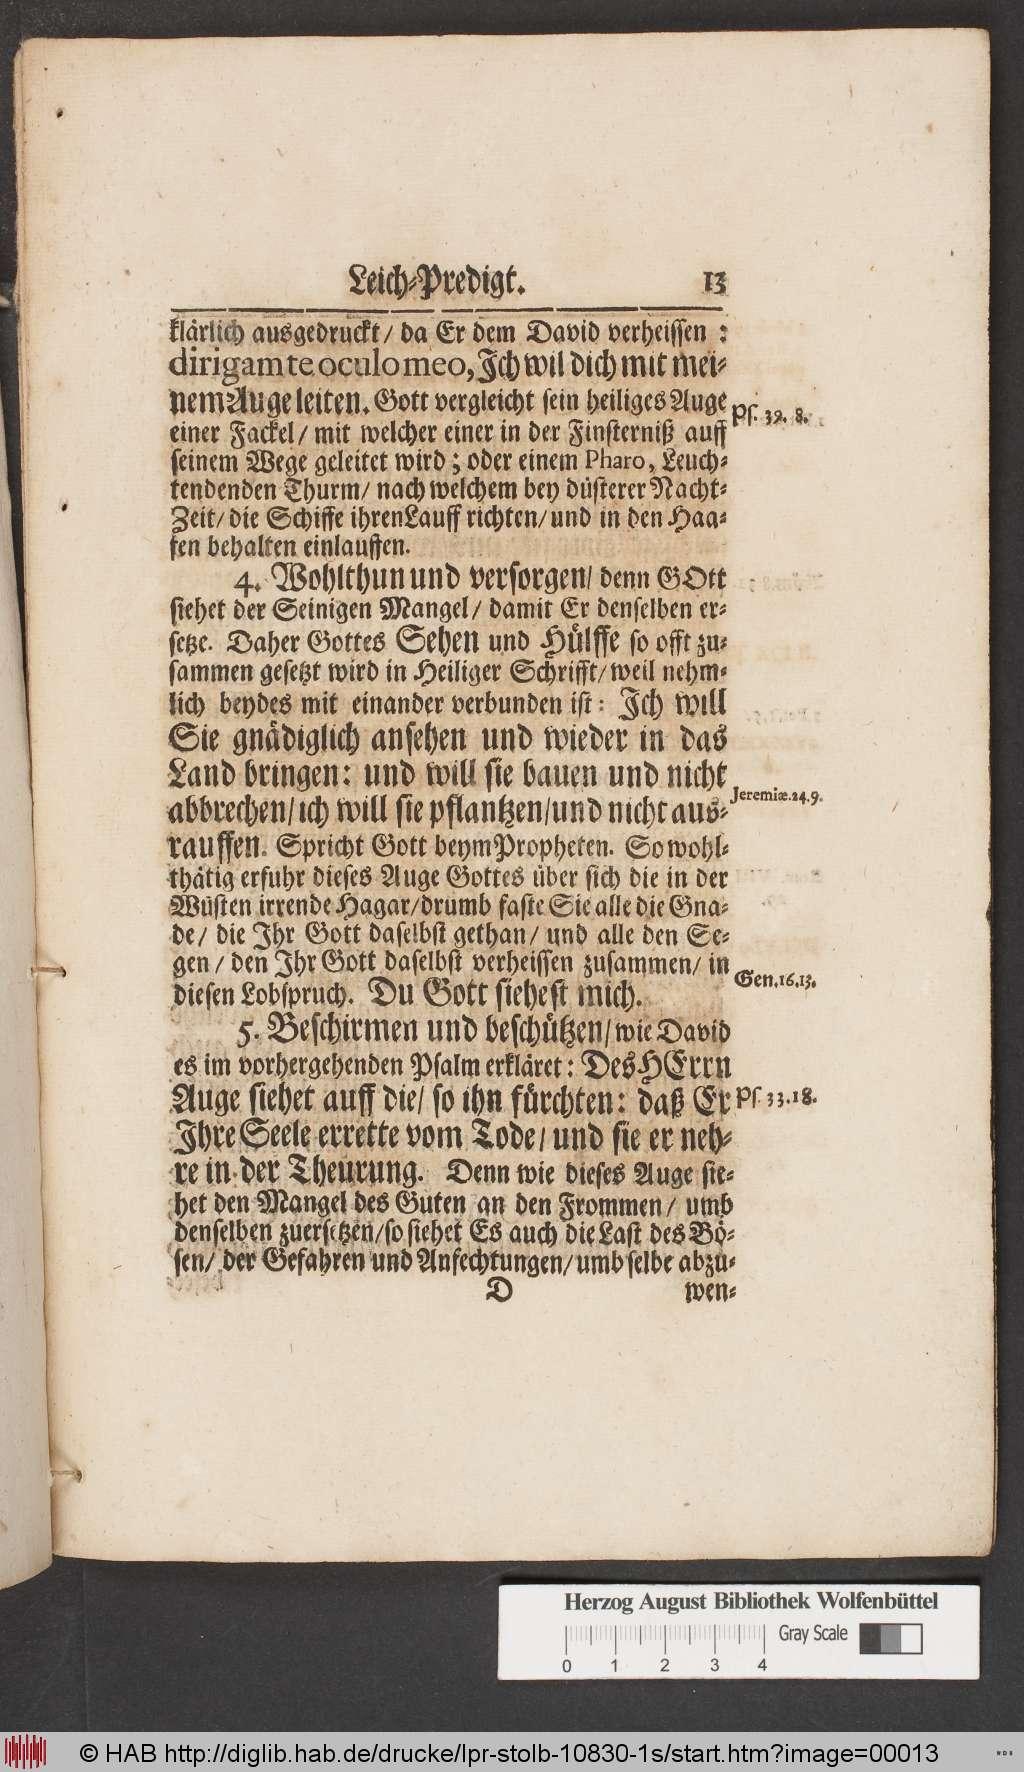 http://diglib.hab.de/drucke/lpr-stolb-10830-1s/00013.jpg